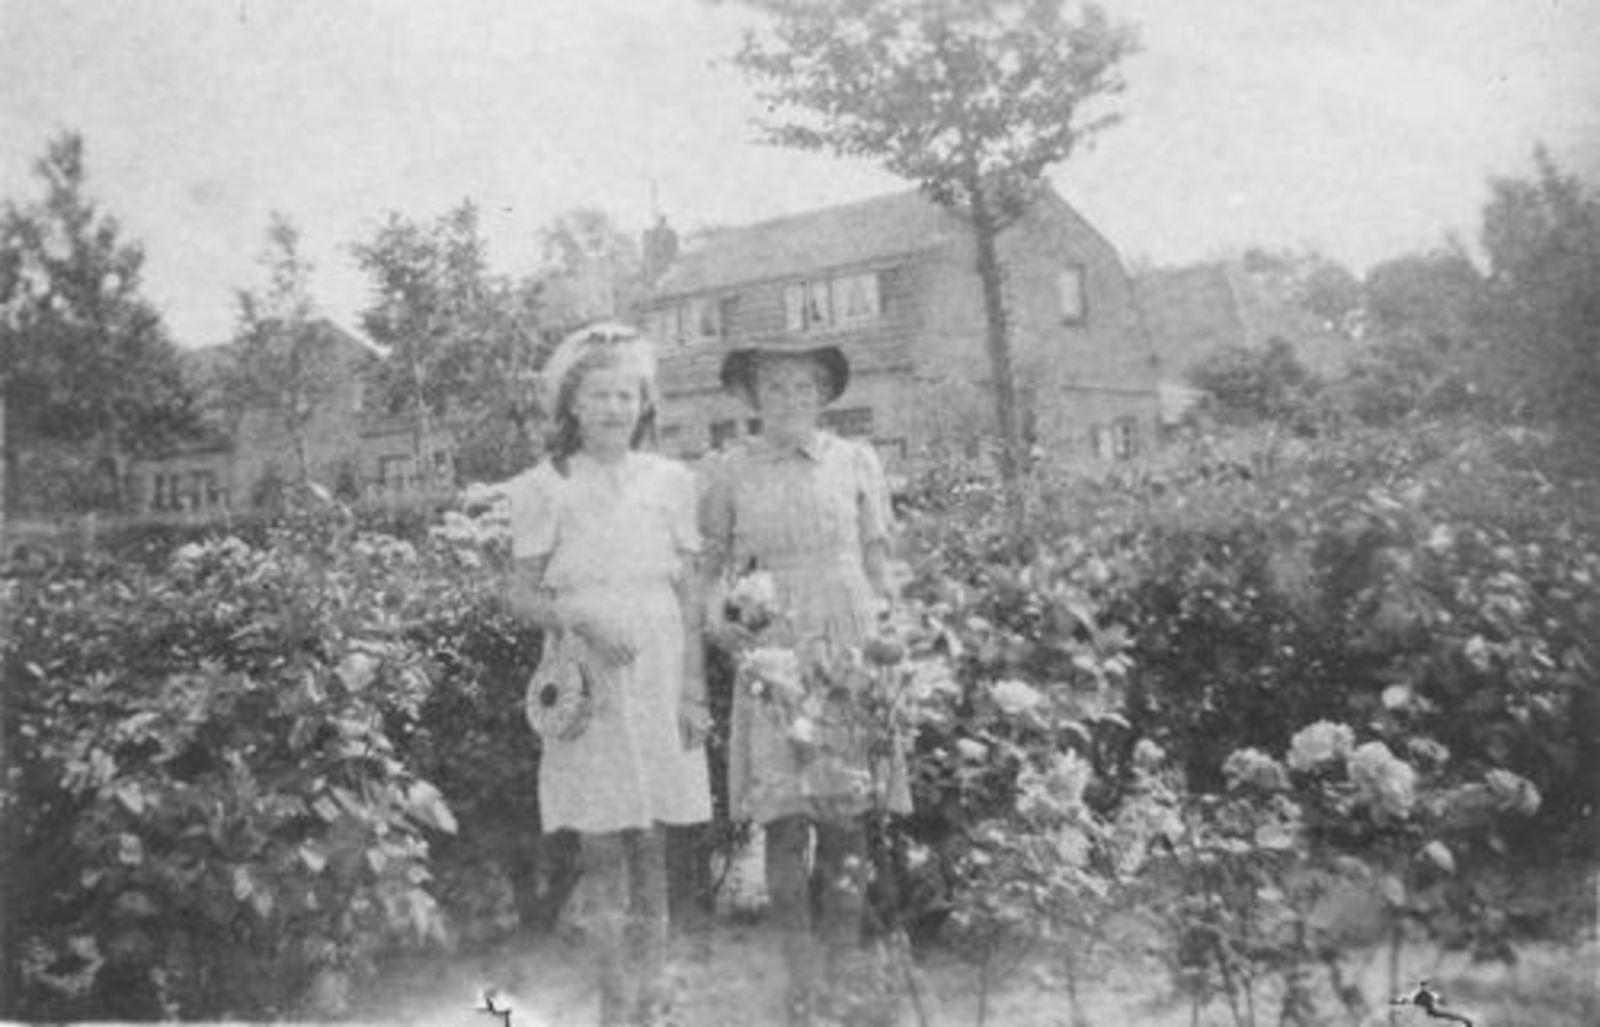 Koeckhoven Ria 1930 1944 in Tuin met Annie Lauret